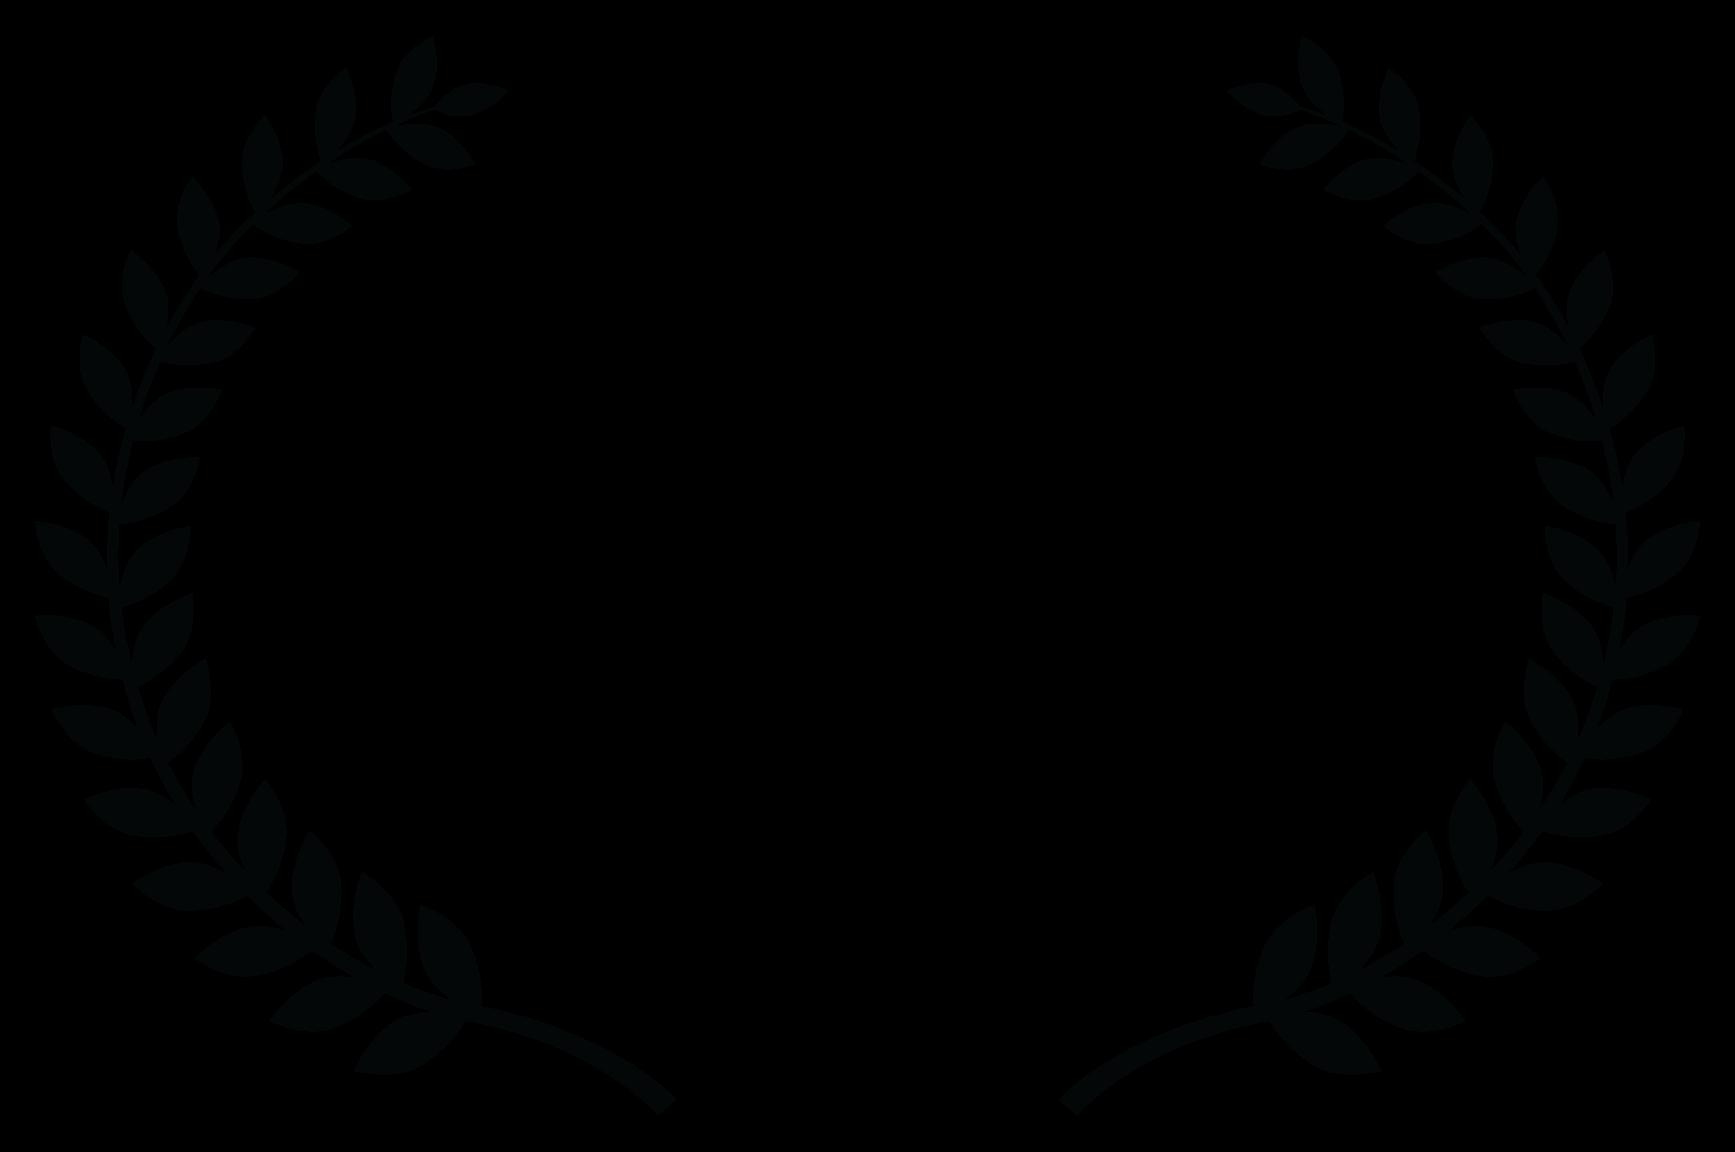 Riffa Regna Internatinoal Film Festival, Canada, 2019 - Best International Documentary Film